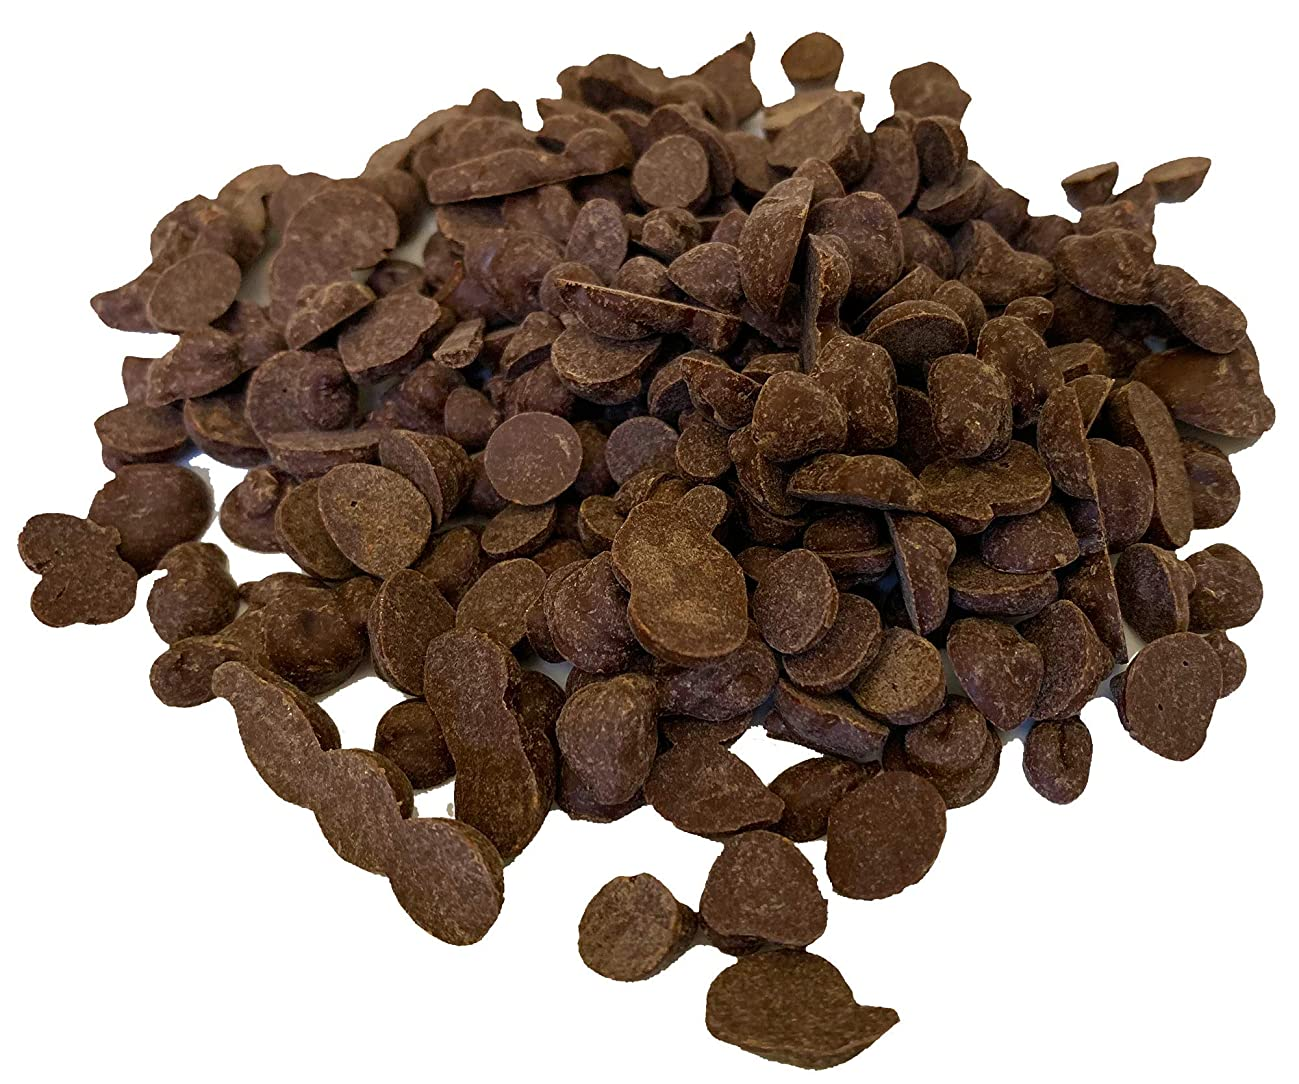 Sugar Free Chocolate Chips Sweetened With Allulose (Keto, Zero Net Carbs, Great for Diabetics, No Artificial Sweeteners, No Sugar Alcohol, No Stevia, Gluten Free, Soy Free, Vegan, Non-GMO) (8 oz)